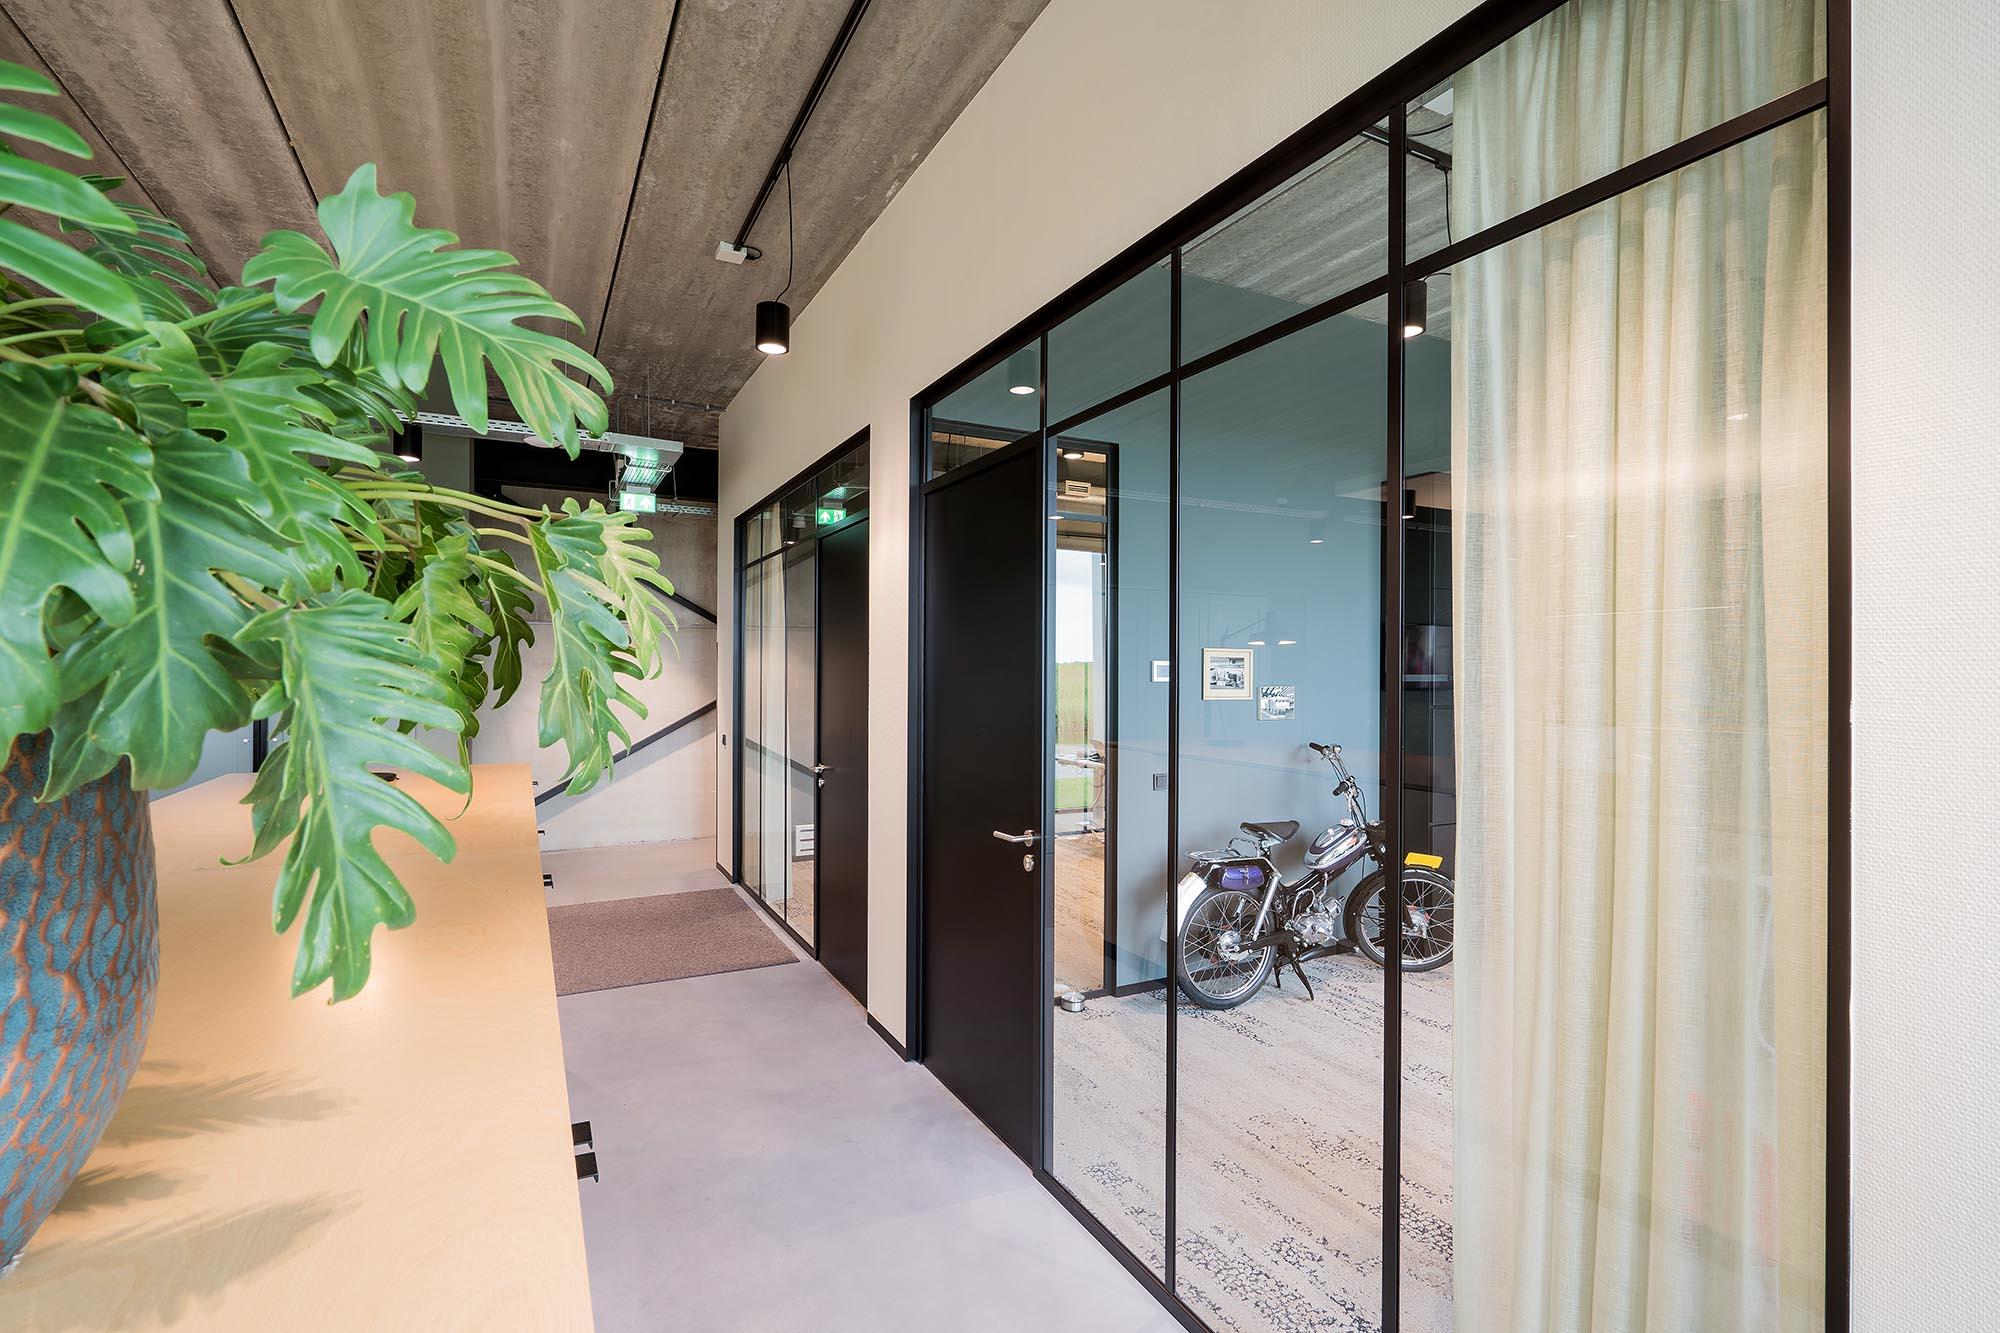 Classic Frame Glaswand met Profielen Vlakverdeling Kantoor Intermontage